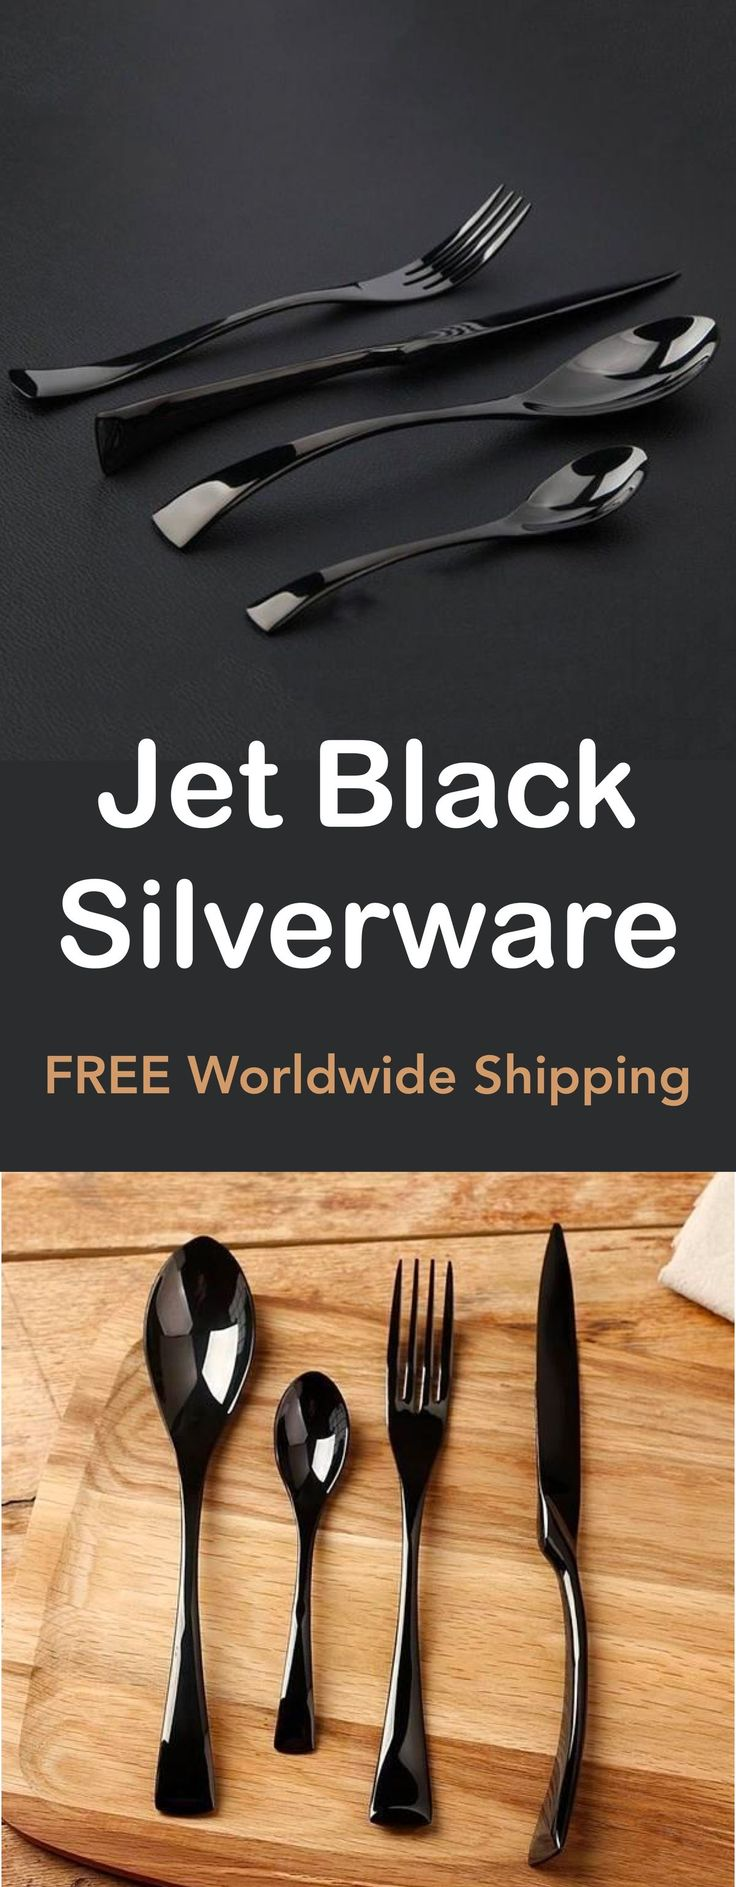 Jet Black Silverware